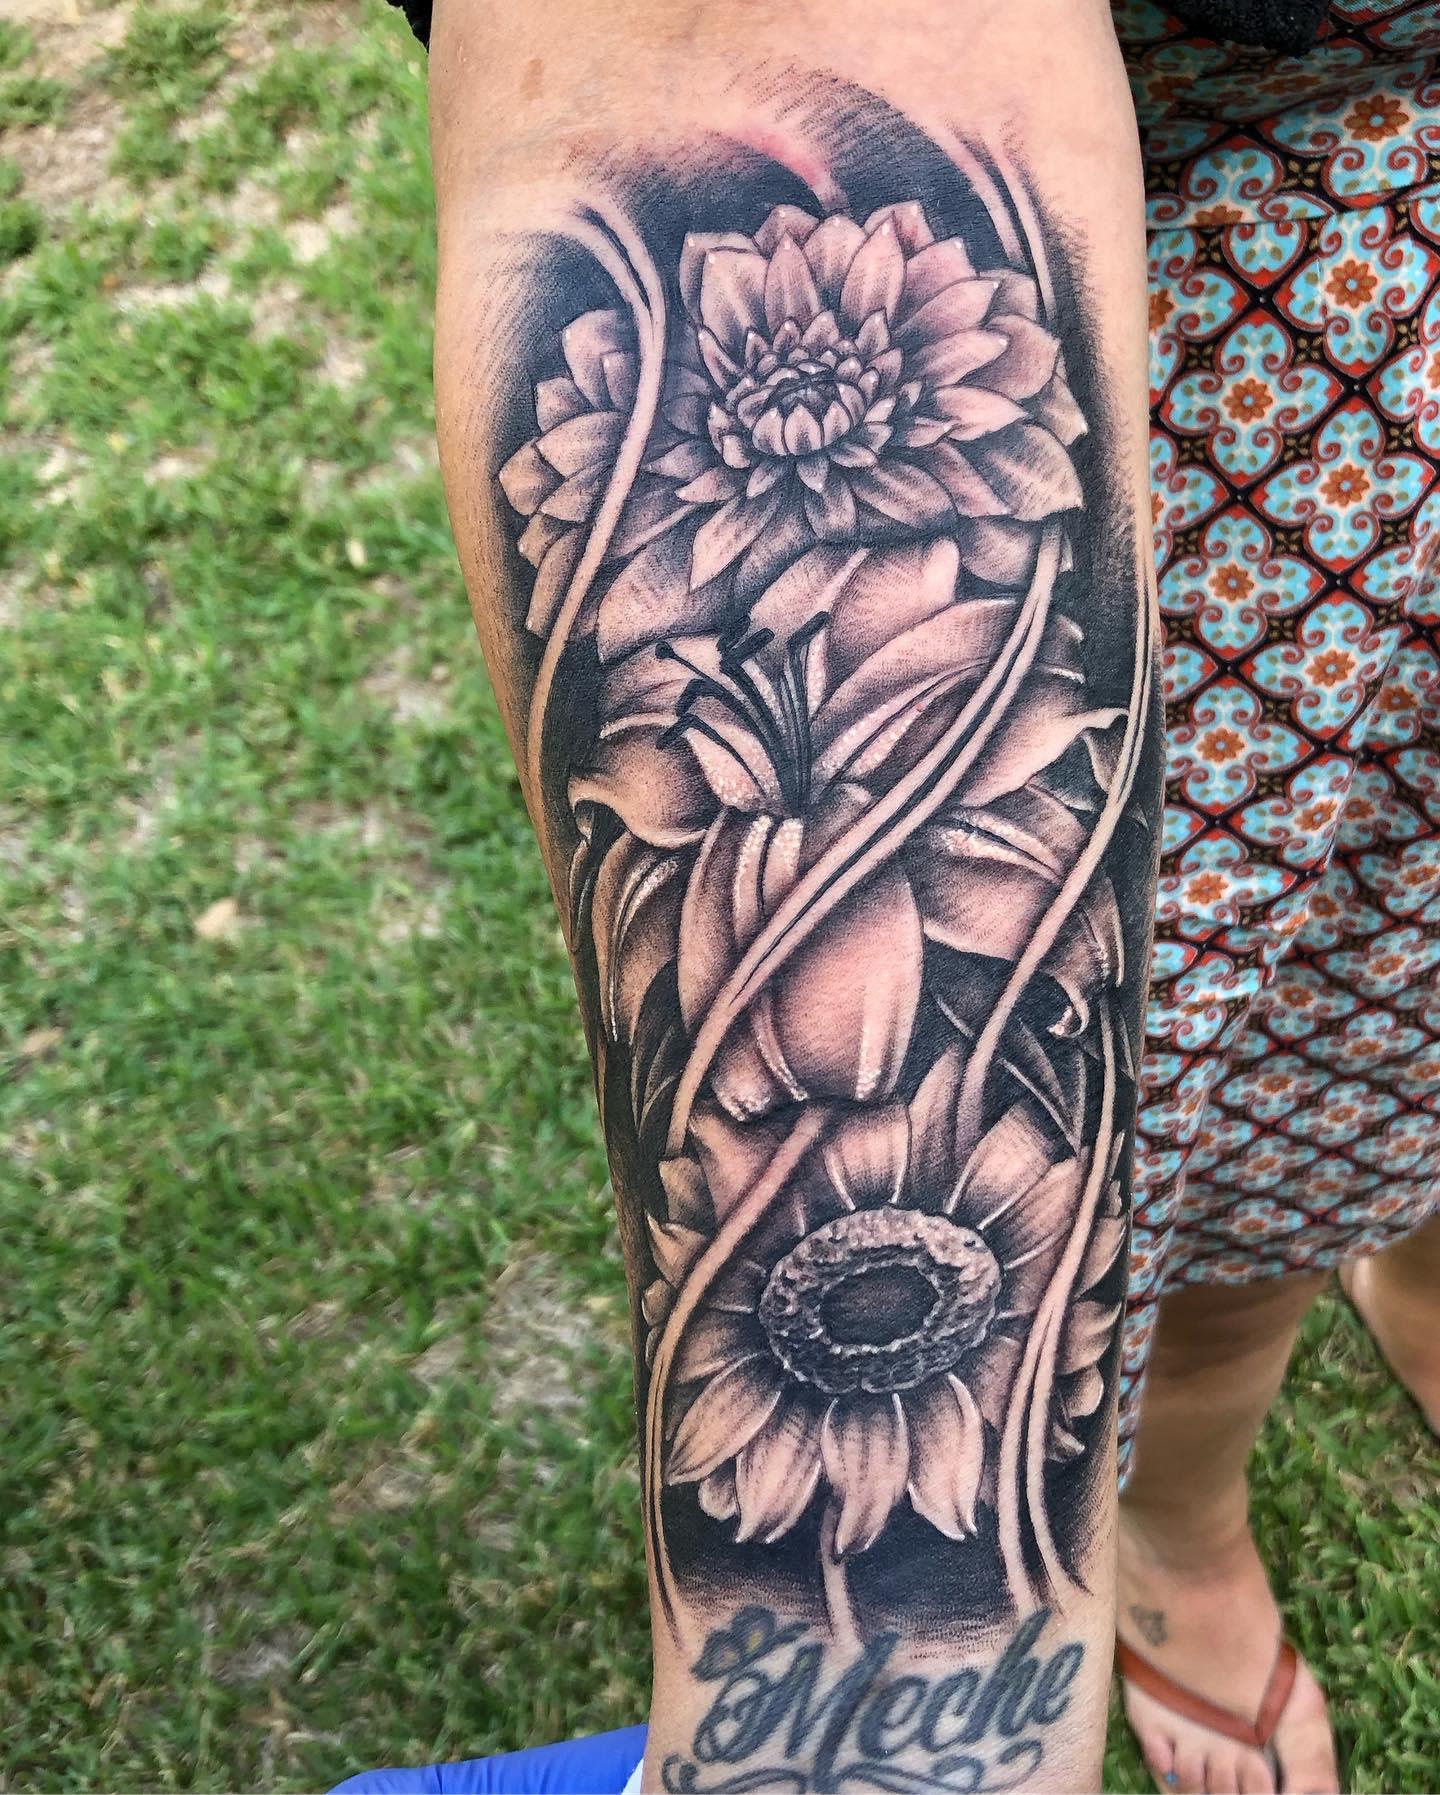 Dahlia Forearm Tattoo -str8blasted951